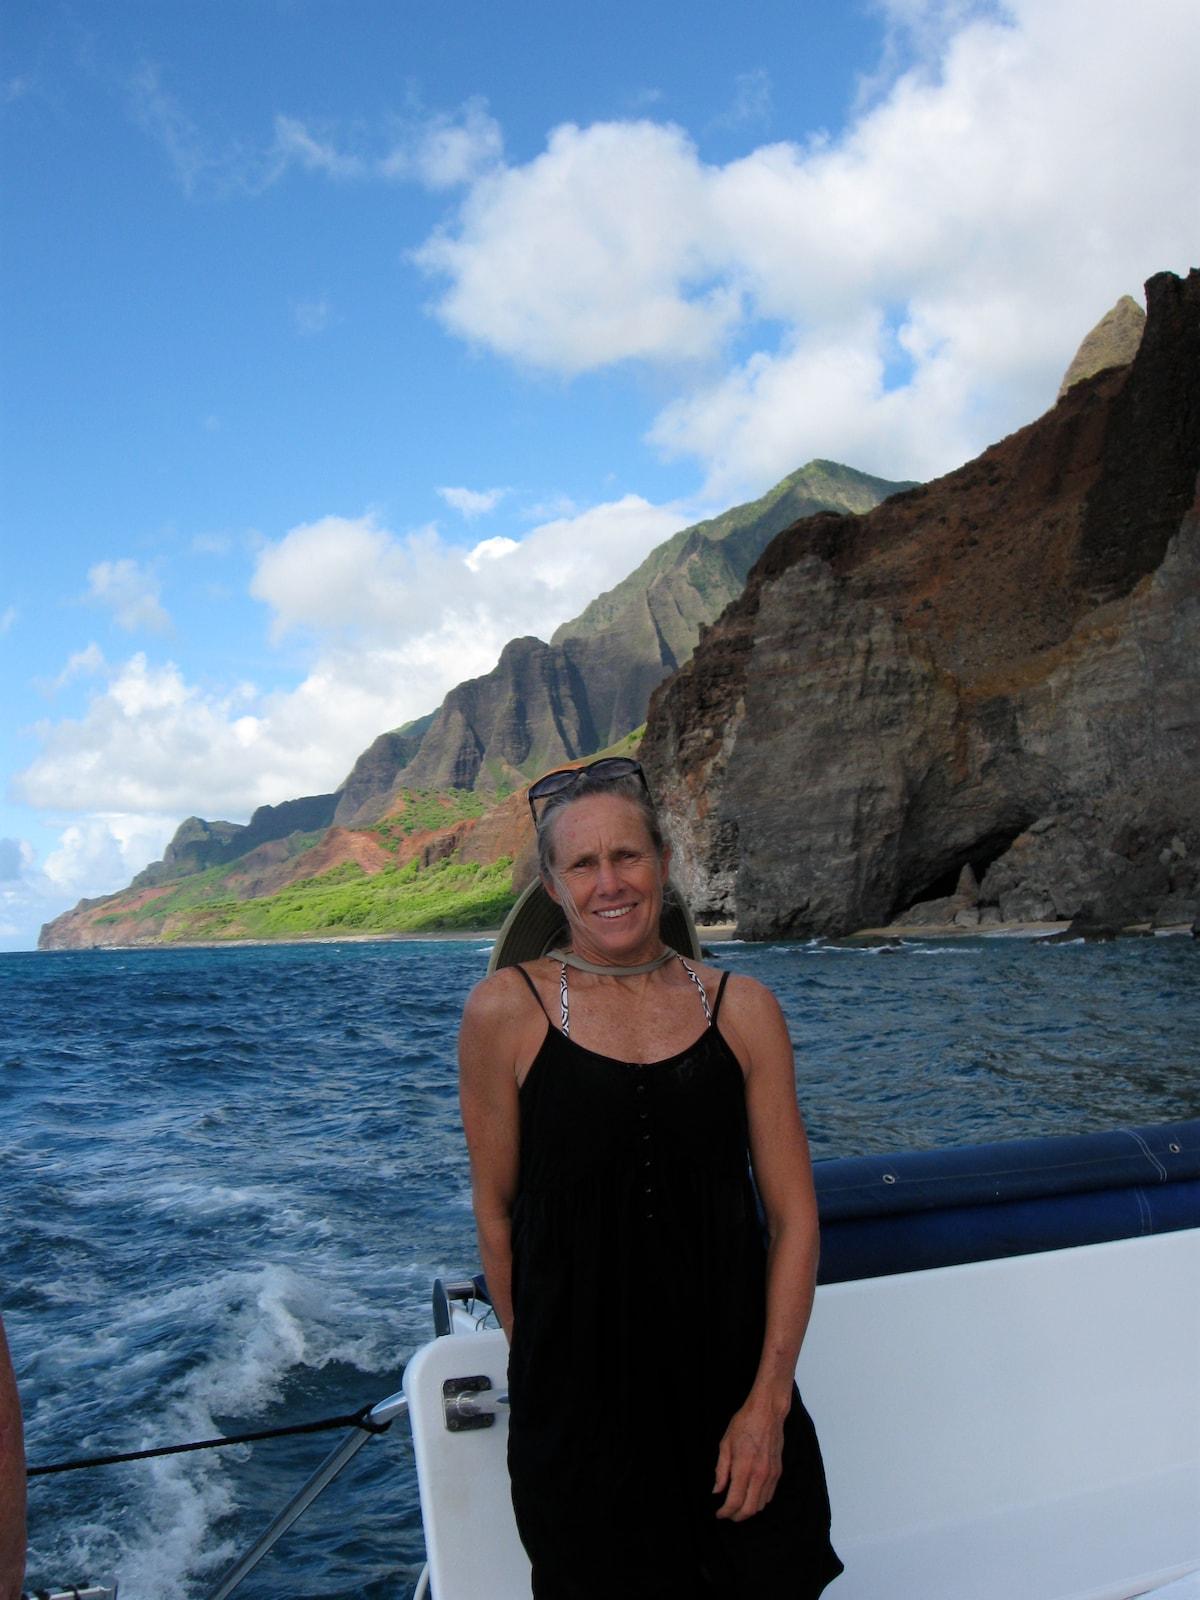 Colleen from Kailua-Kona